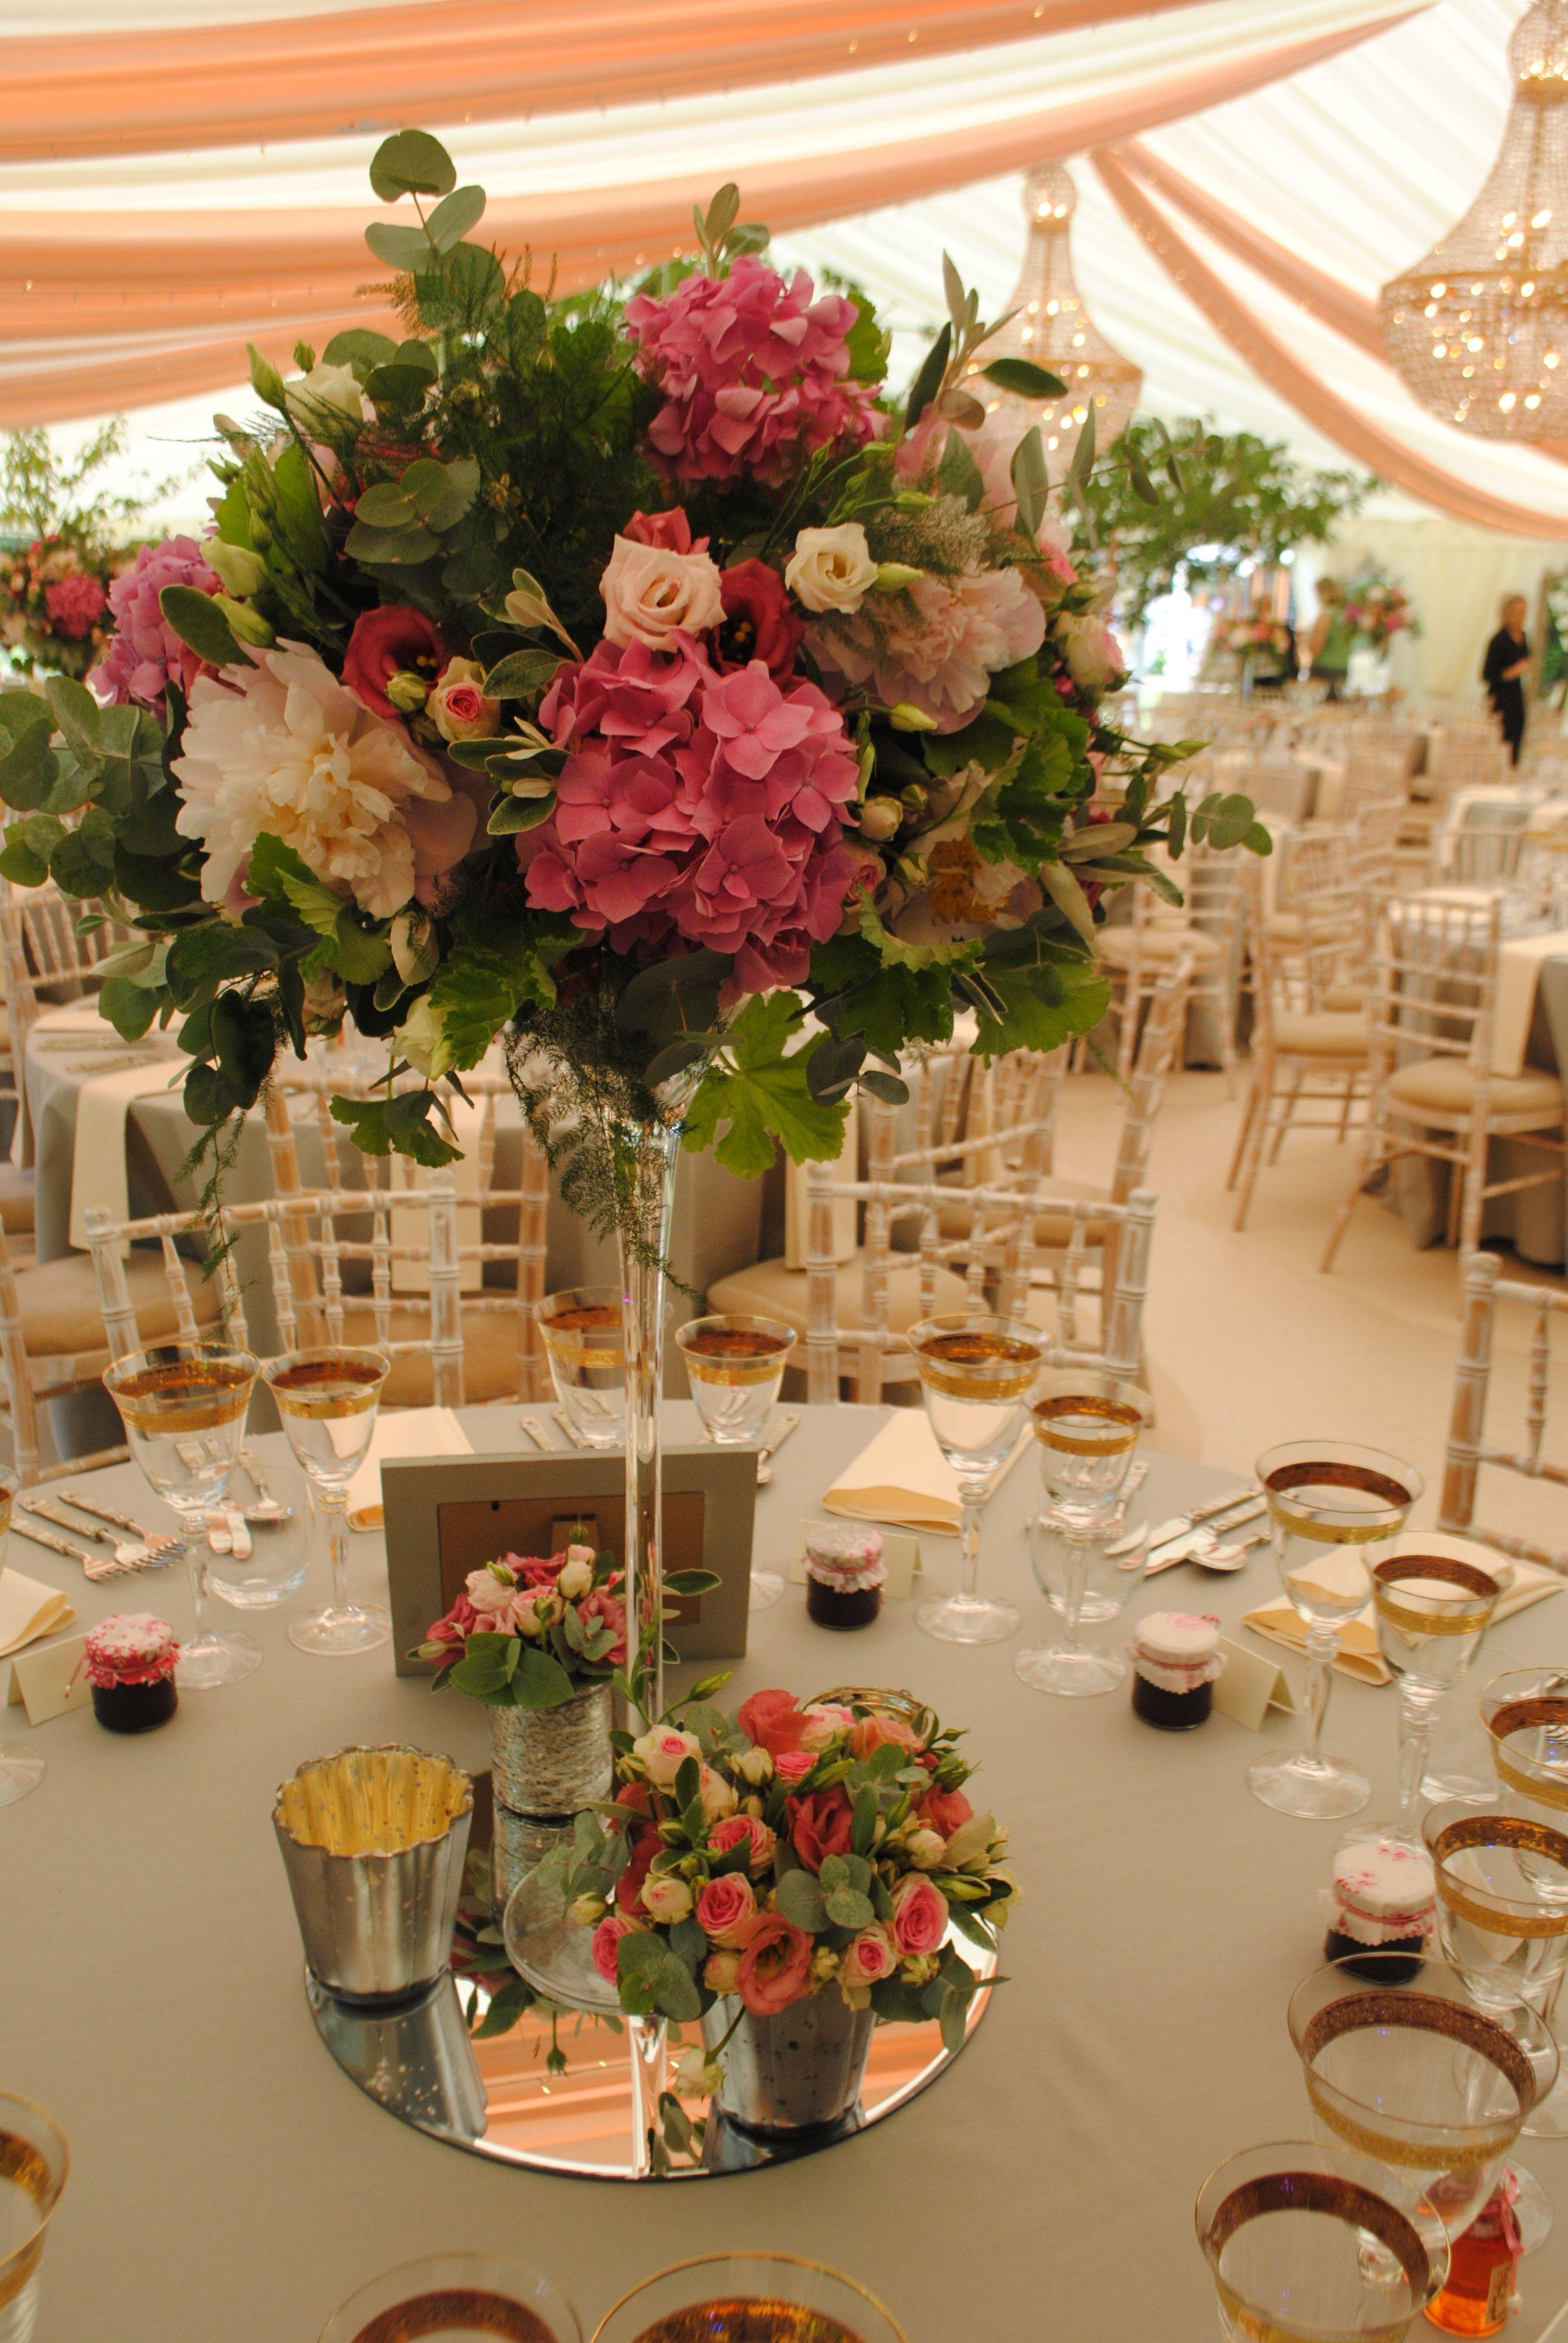 Pink wedding flower table arrangements in martini vases pink wedding flower table arrangements in martini vases reviewsmspy